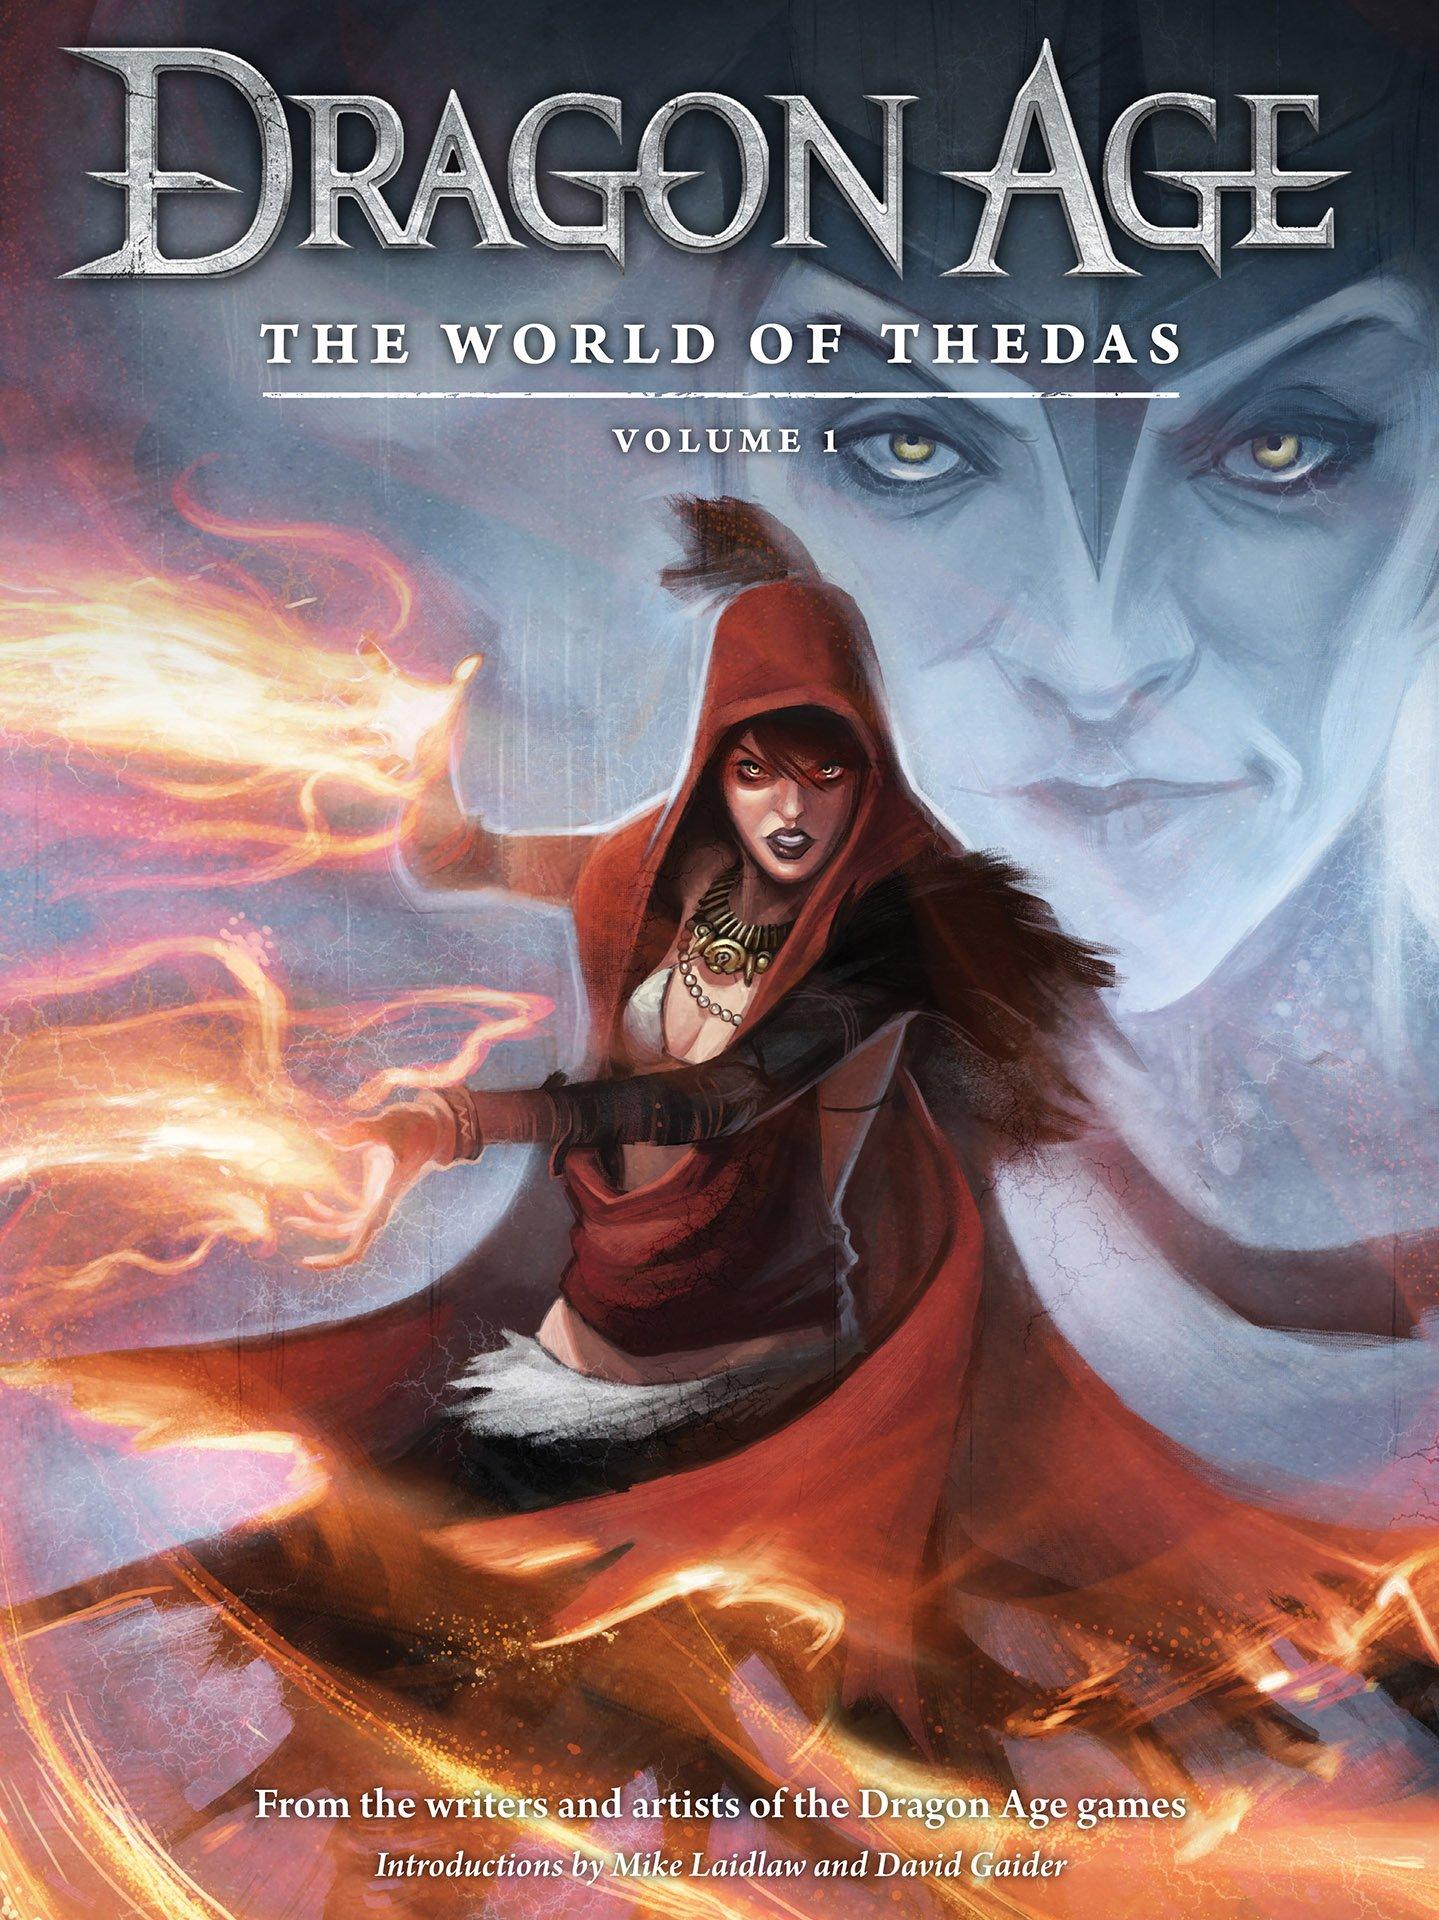 Dragon Age - The World of Thedas Volume 1